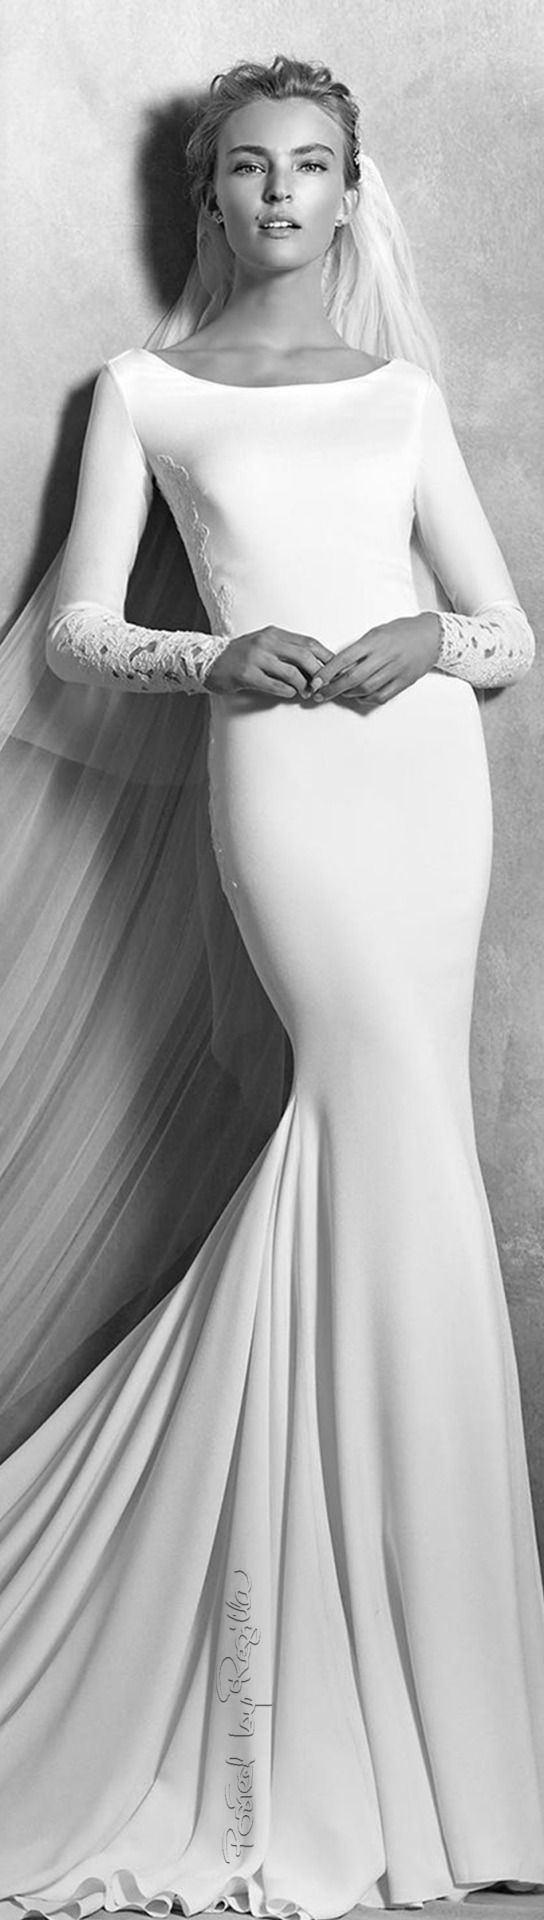 Long sleeve black wedding dresses  Regilla  Una Fiorentina in California  Wedding Dresses Mermaid